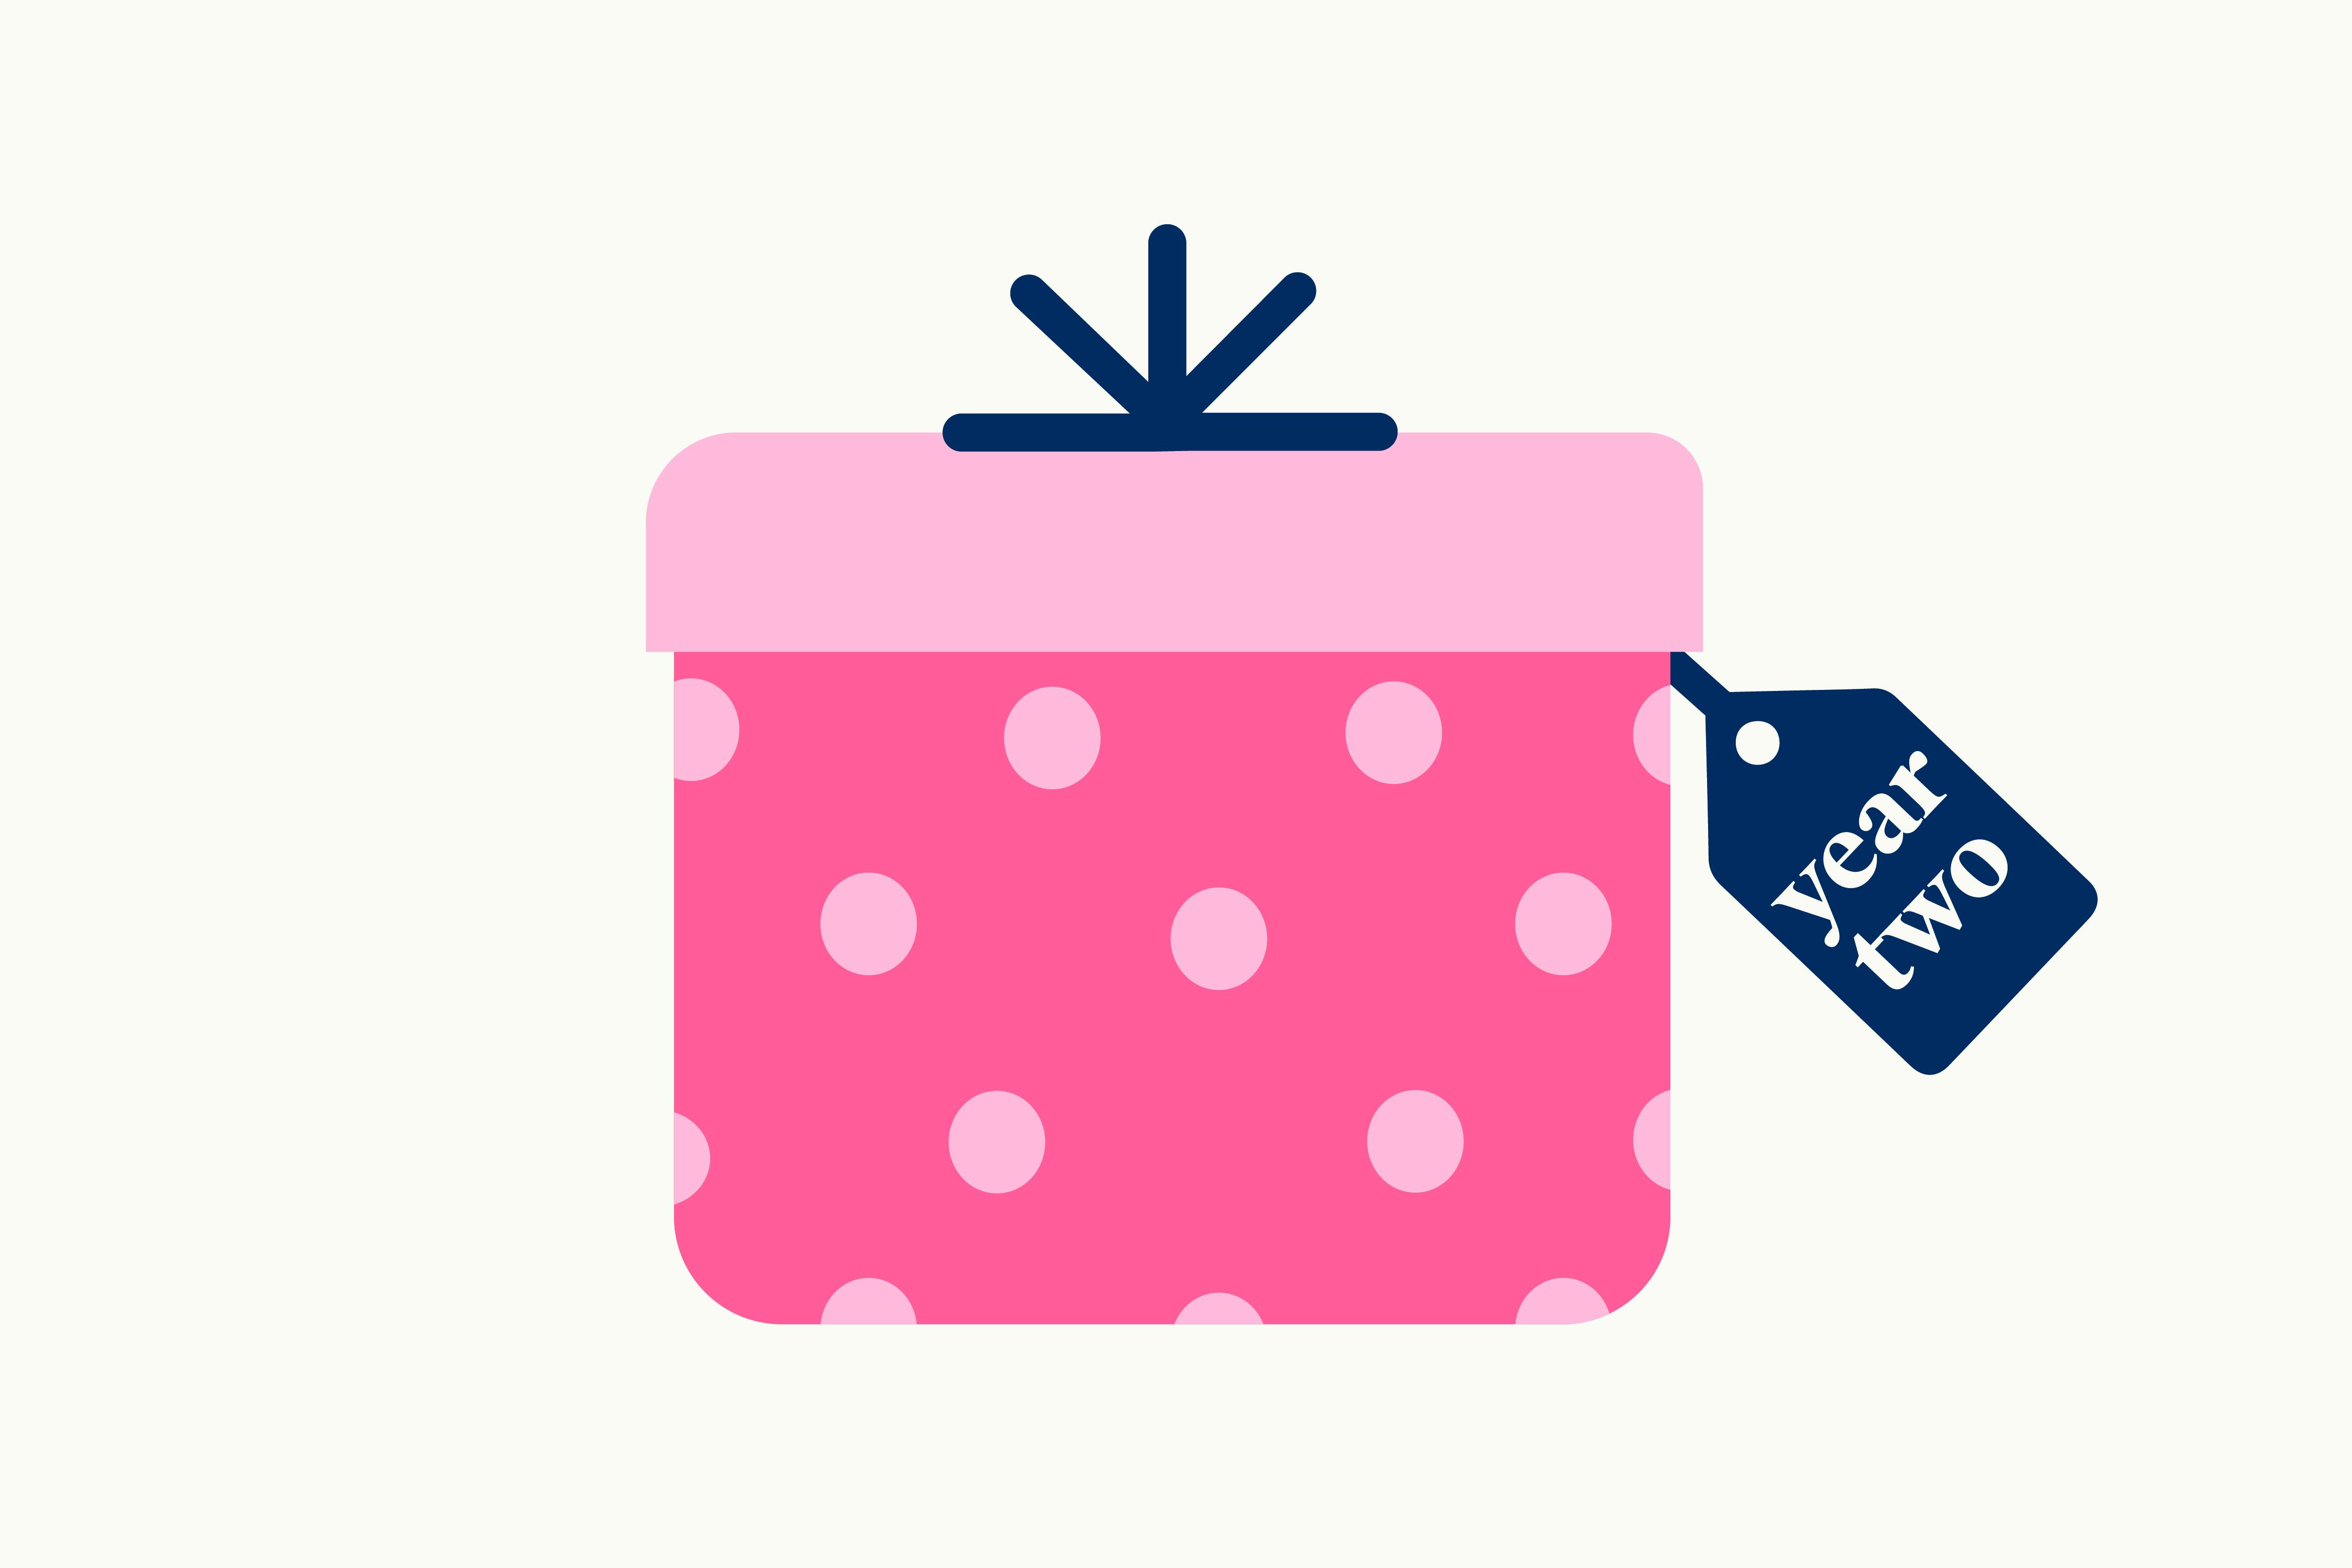 Wedding Anniversary Gift Ideas To Celebrate Each Milestone Printables Zola Expert Wedding Advice